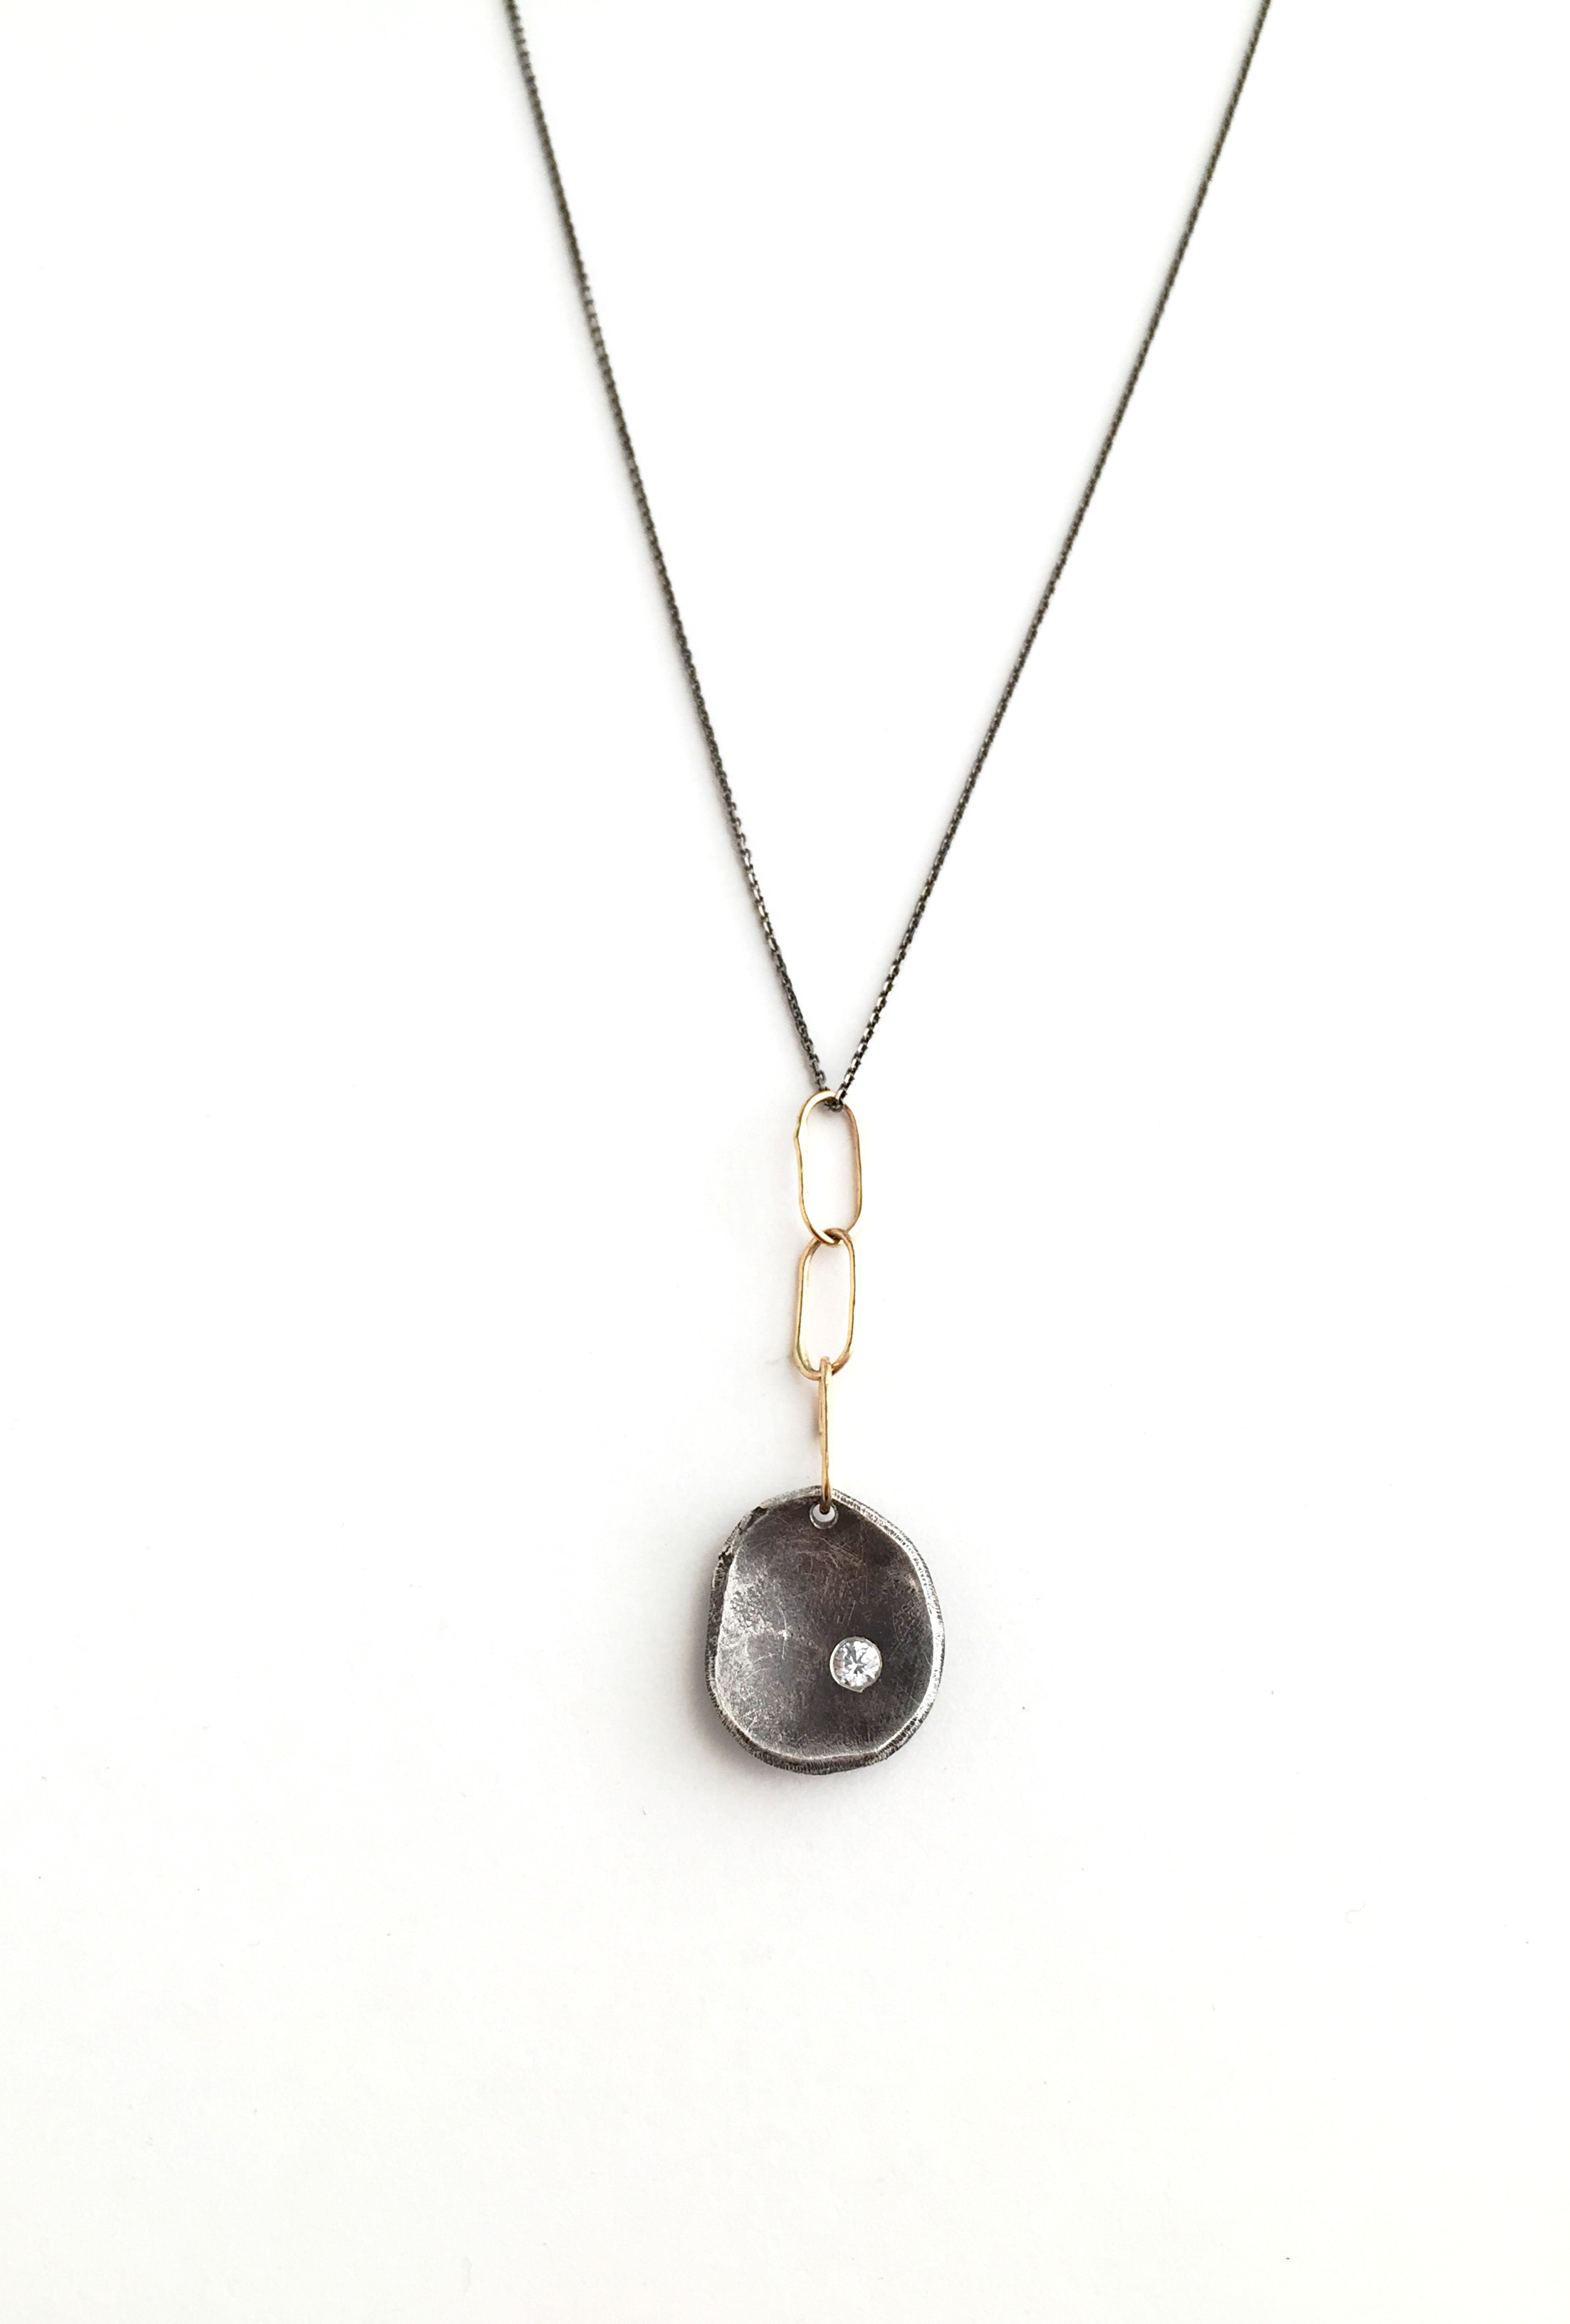 minimalist-fine-jewelry-black-white-diamond-14-karat-yellow-gold-oxidized-sterling-silver-necklace-earrings-gemstone-ring.jpg